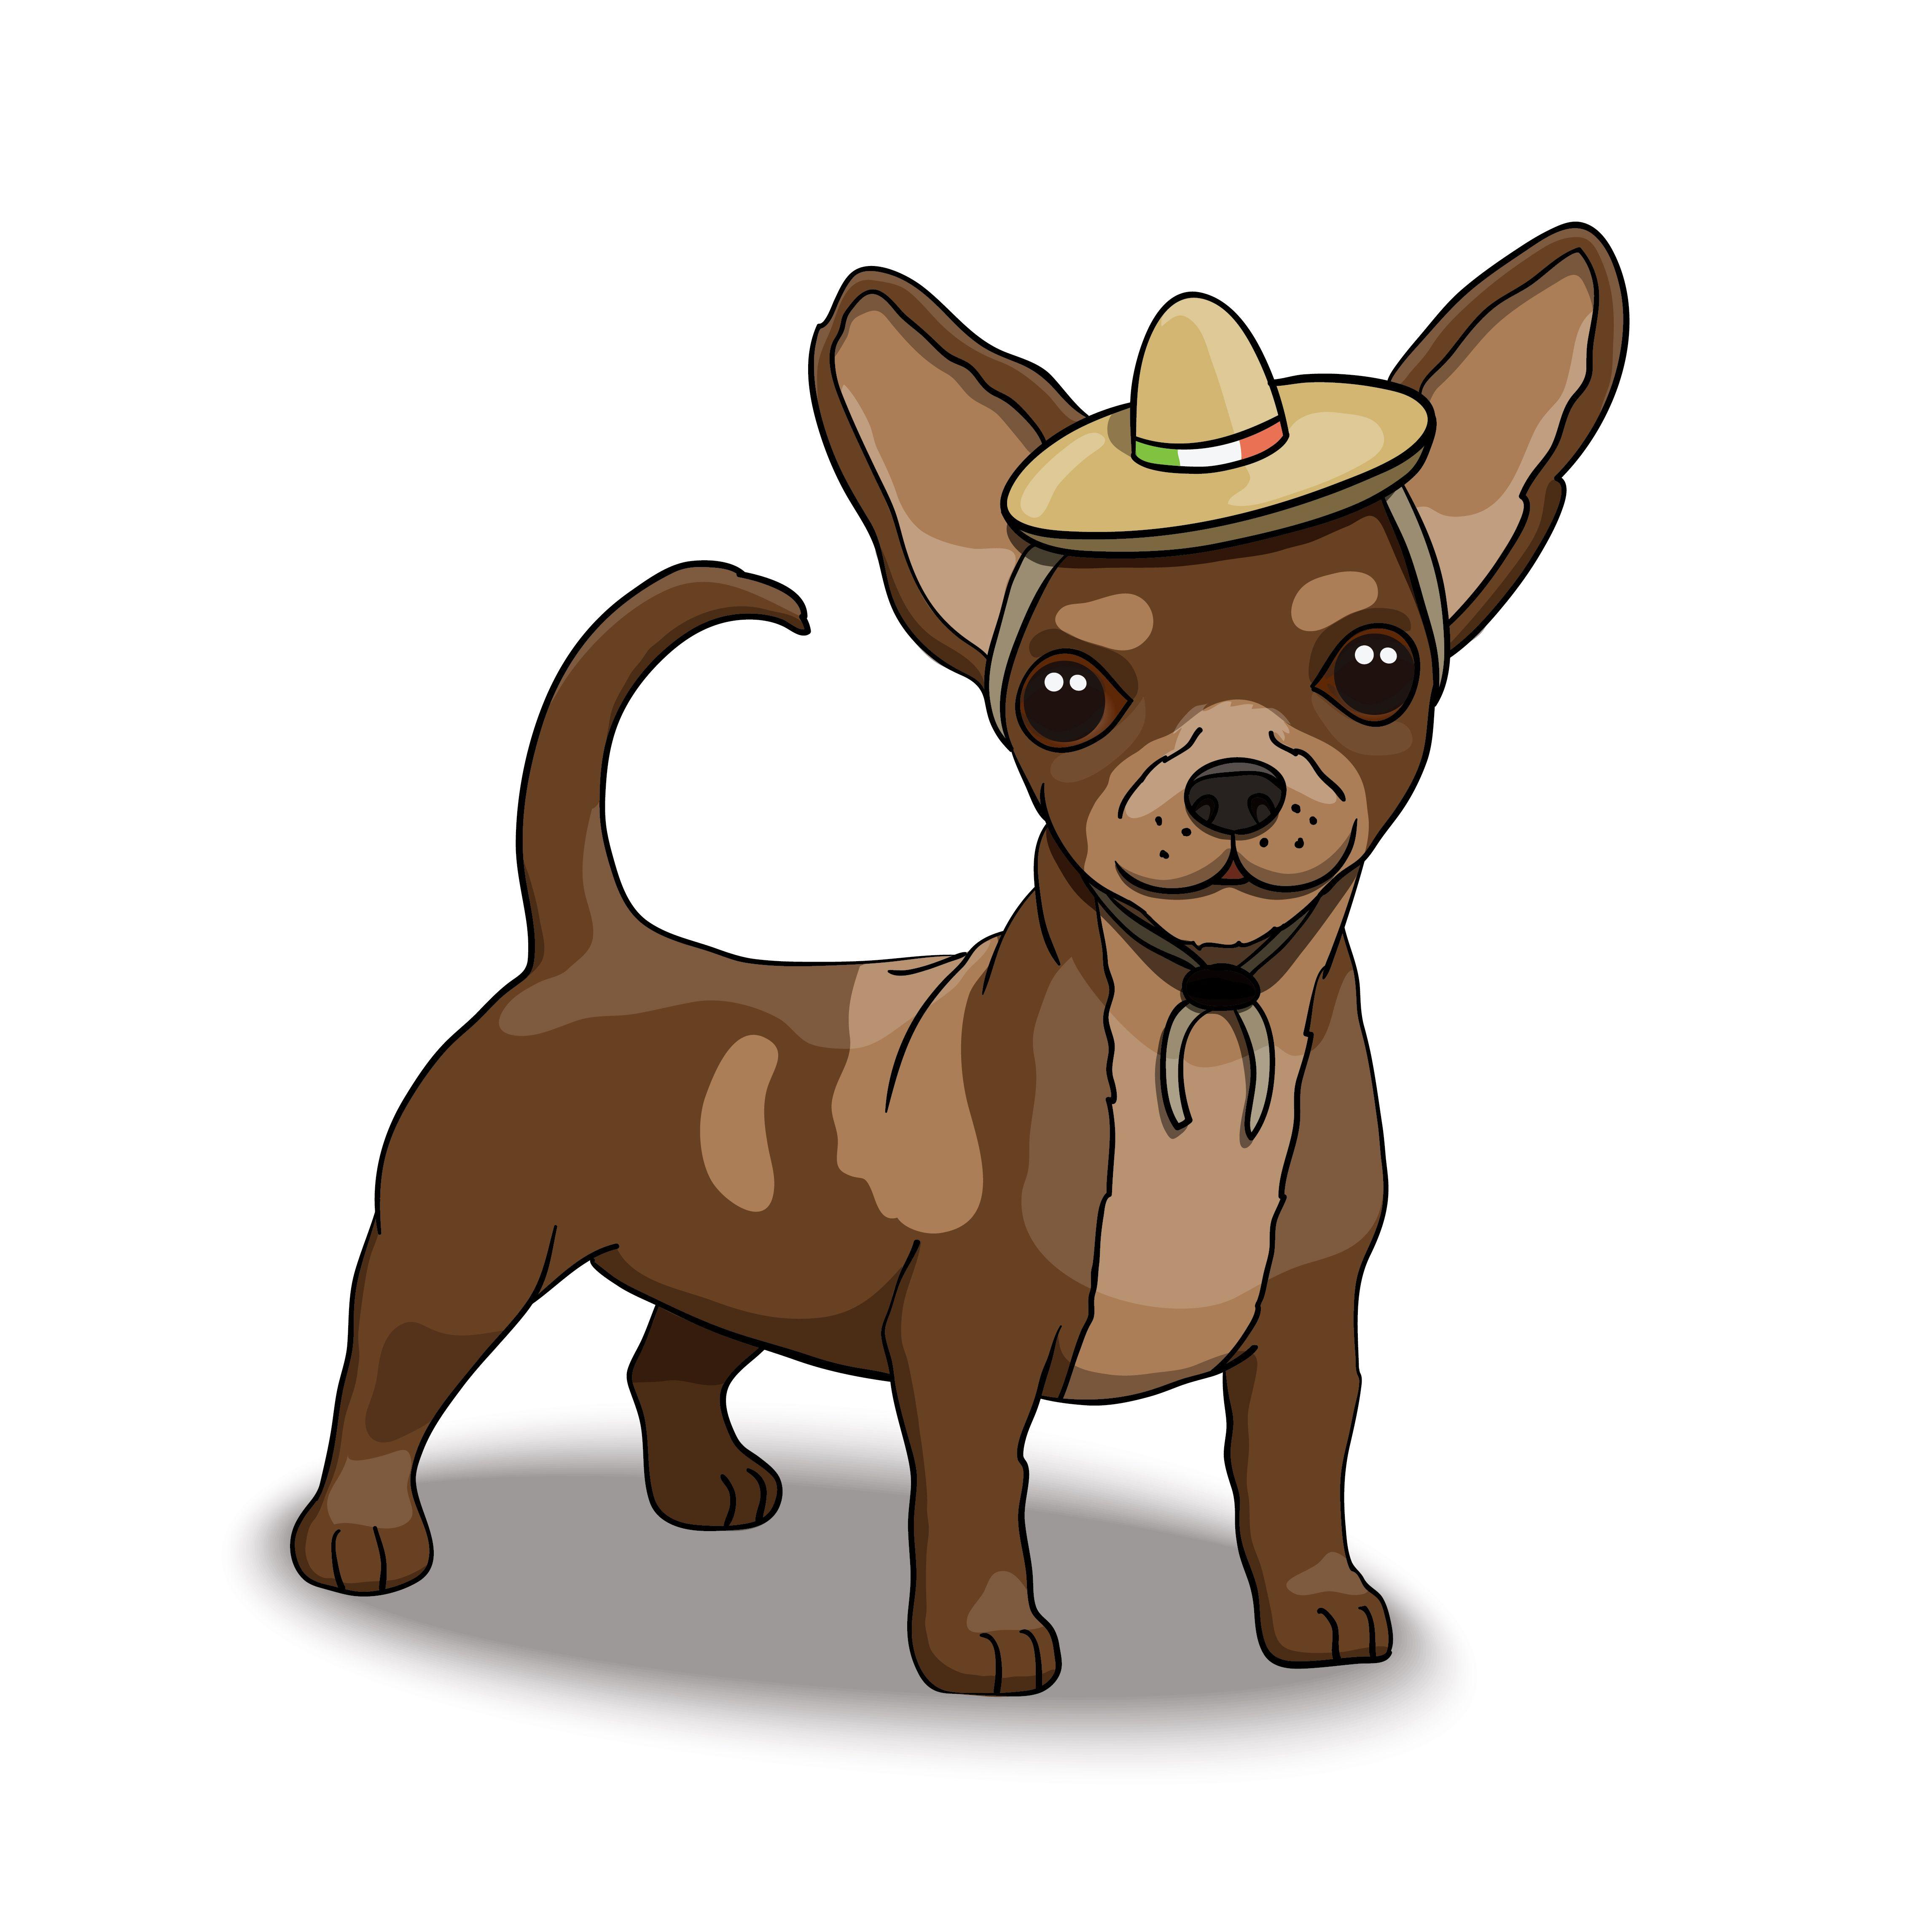 Chihuahua Smiling Cartoon Character Wearing Sombrero